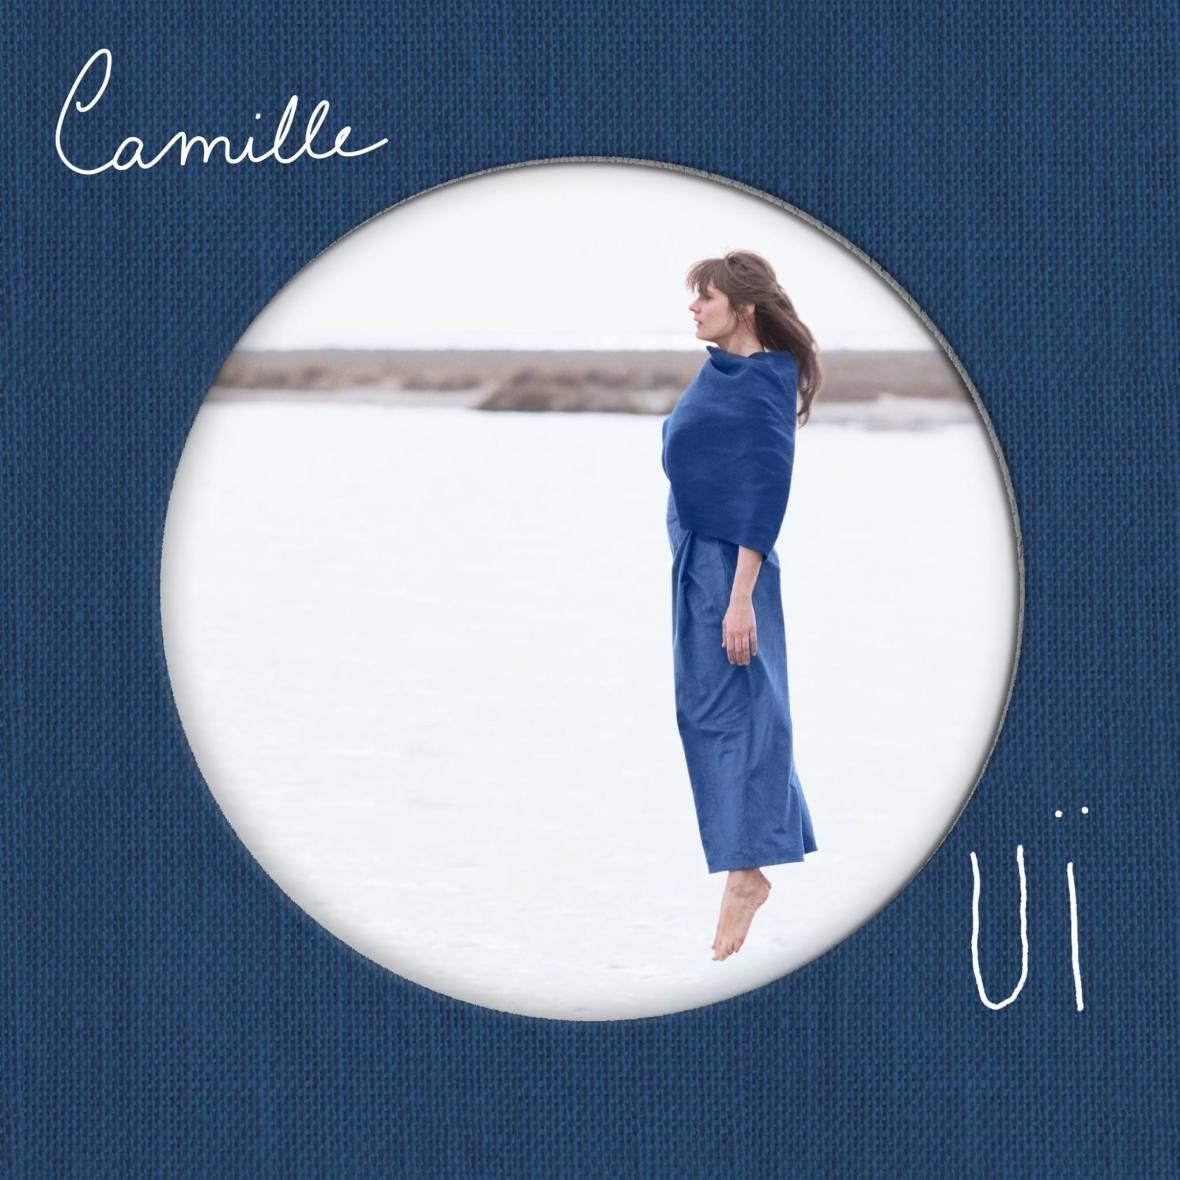 Camille, Oui